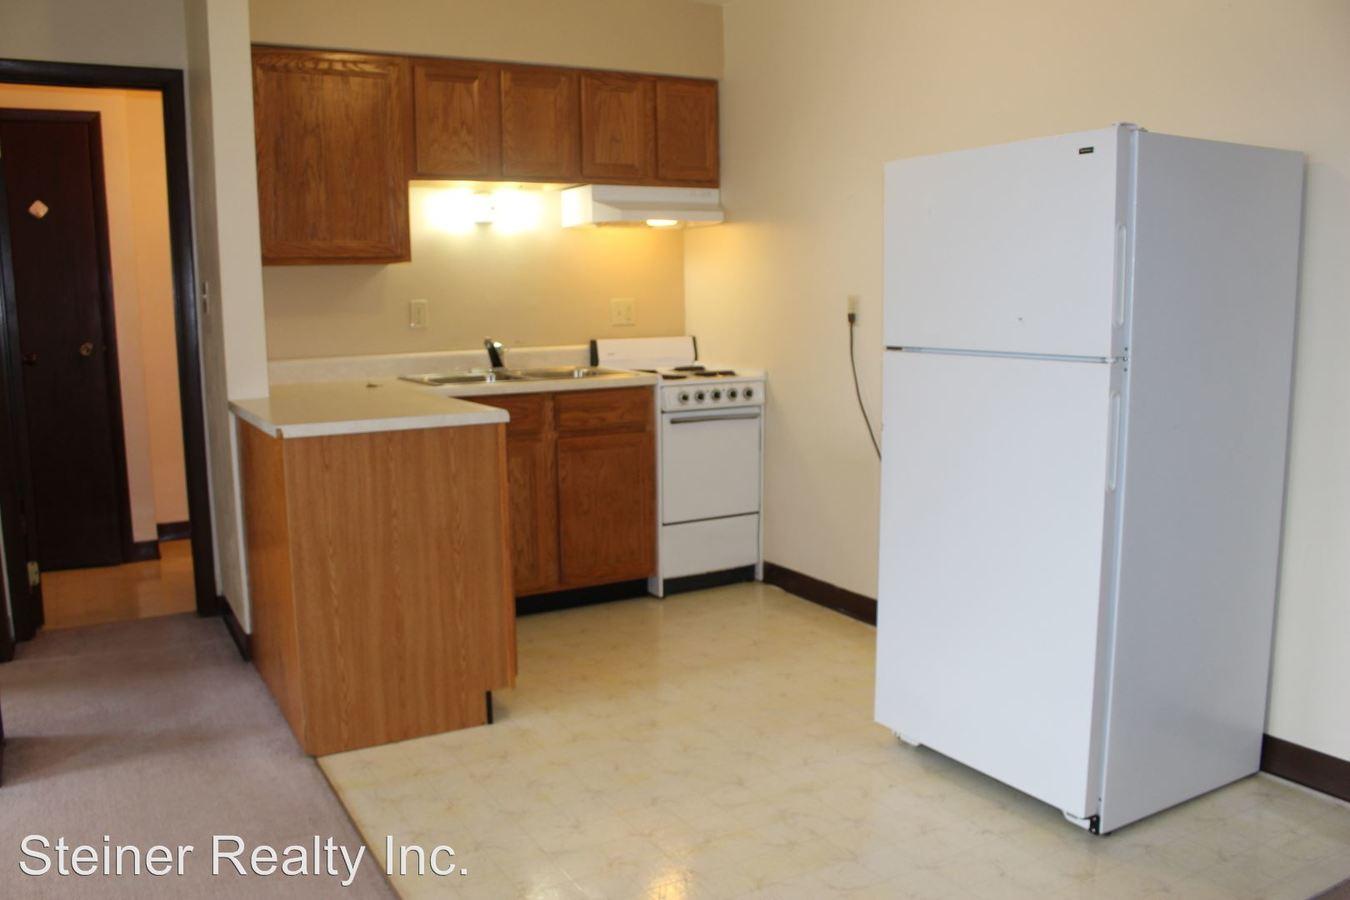 1 Bedroom 1 Bathroom Apartment for rent at Ridgeview School Apartments in Coraopolis, PA